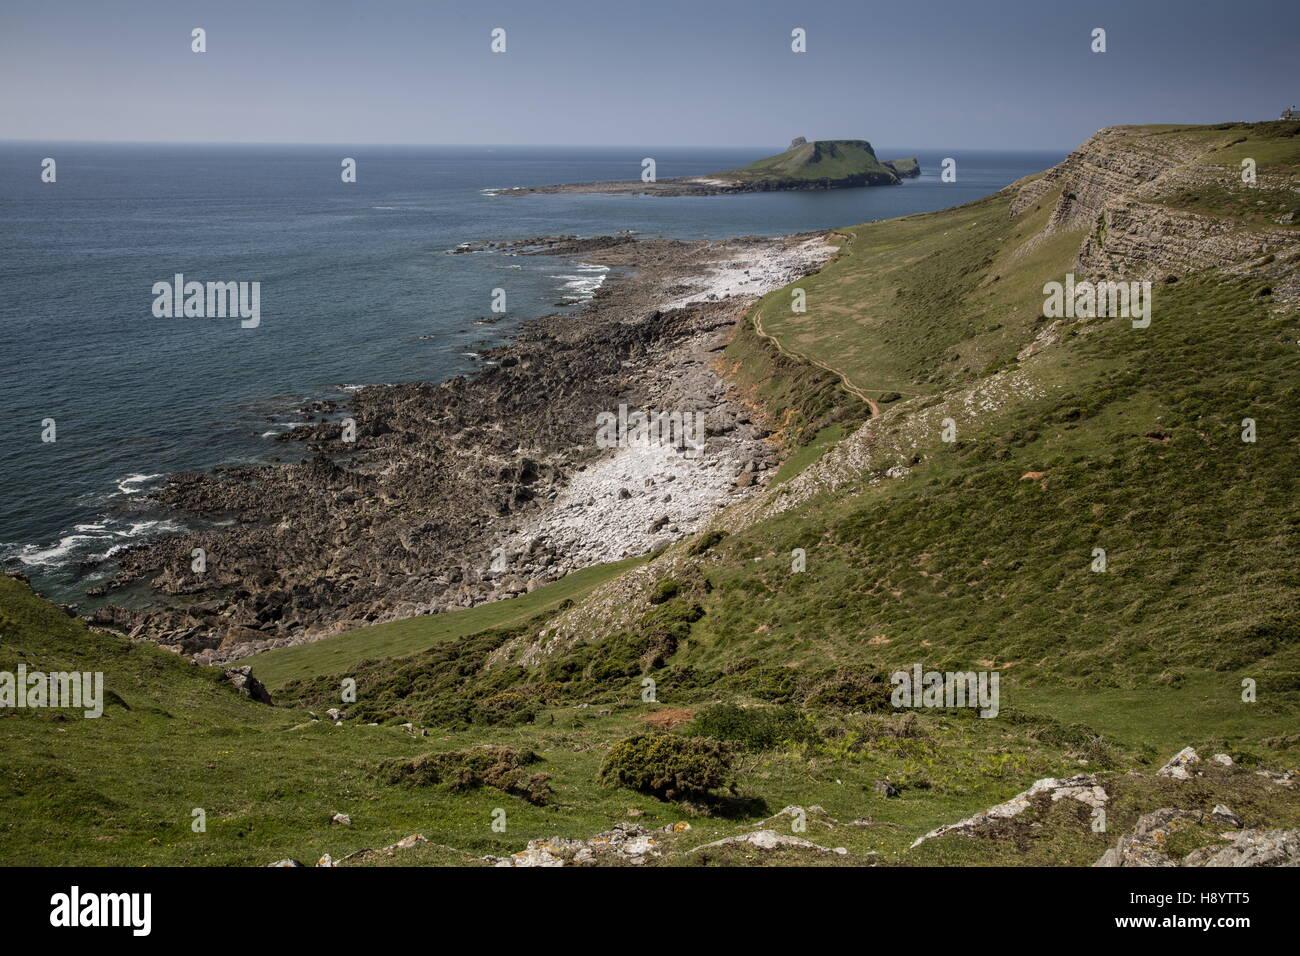 South coast limestone cliffs at  Worm's Head, Rhossili; Gower Peninsula AONB, South Wales. - Stock Image